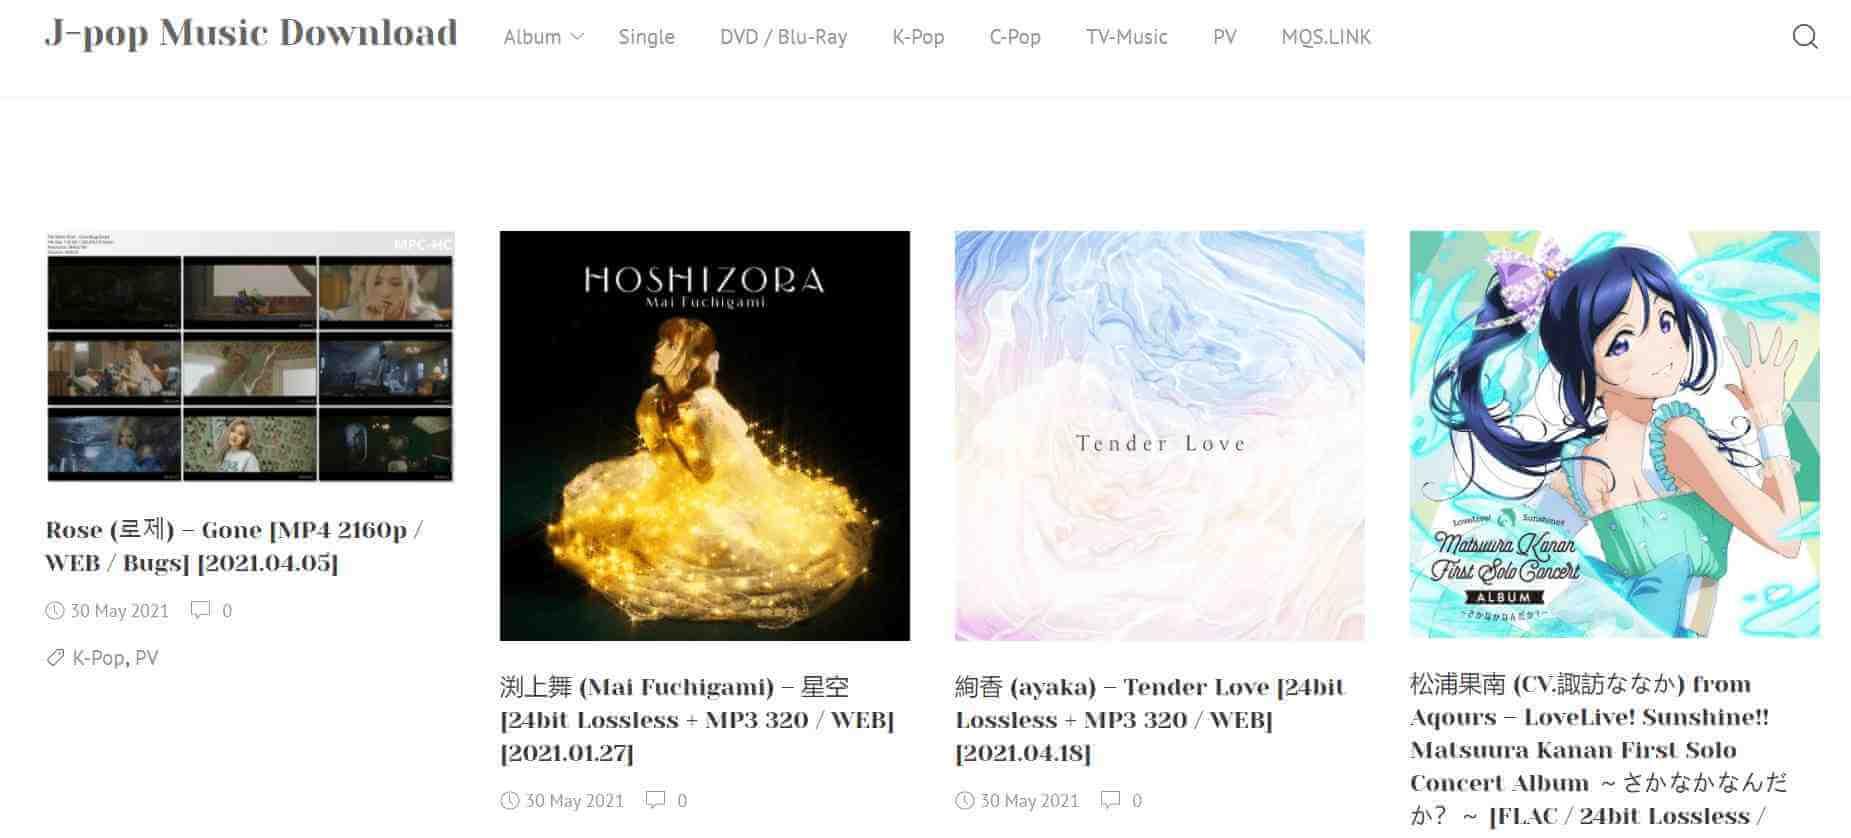 j-pop-music-download